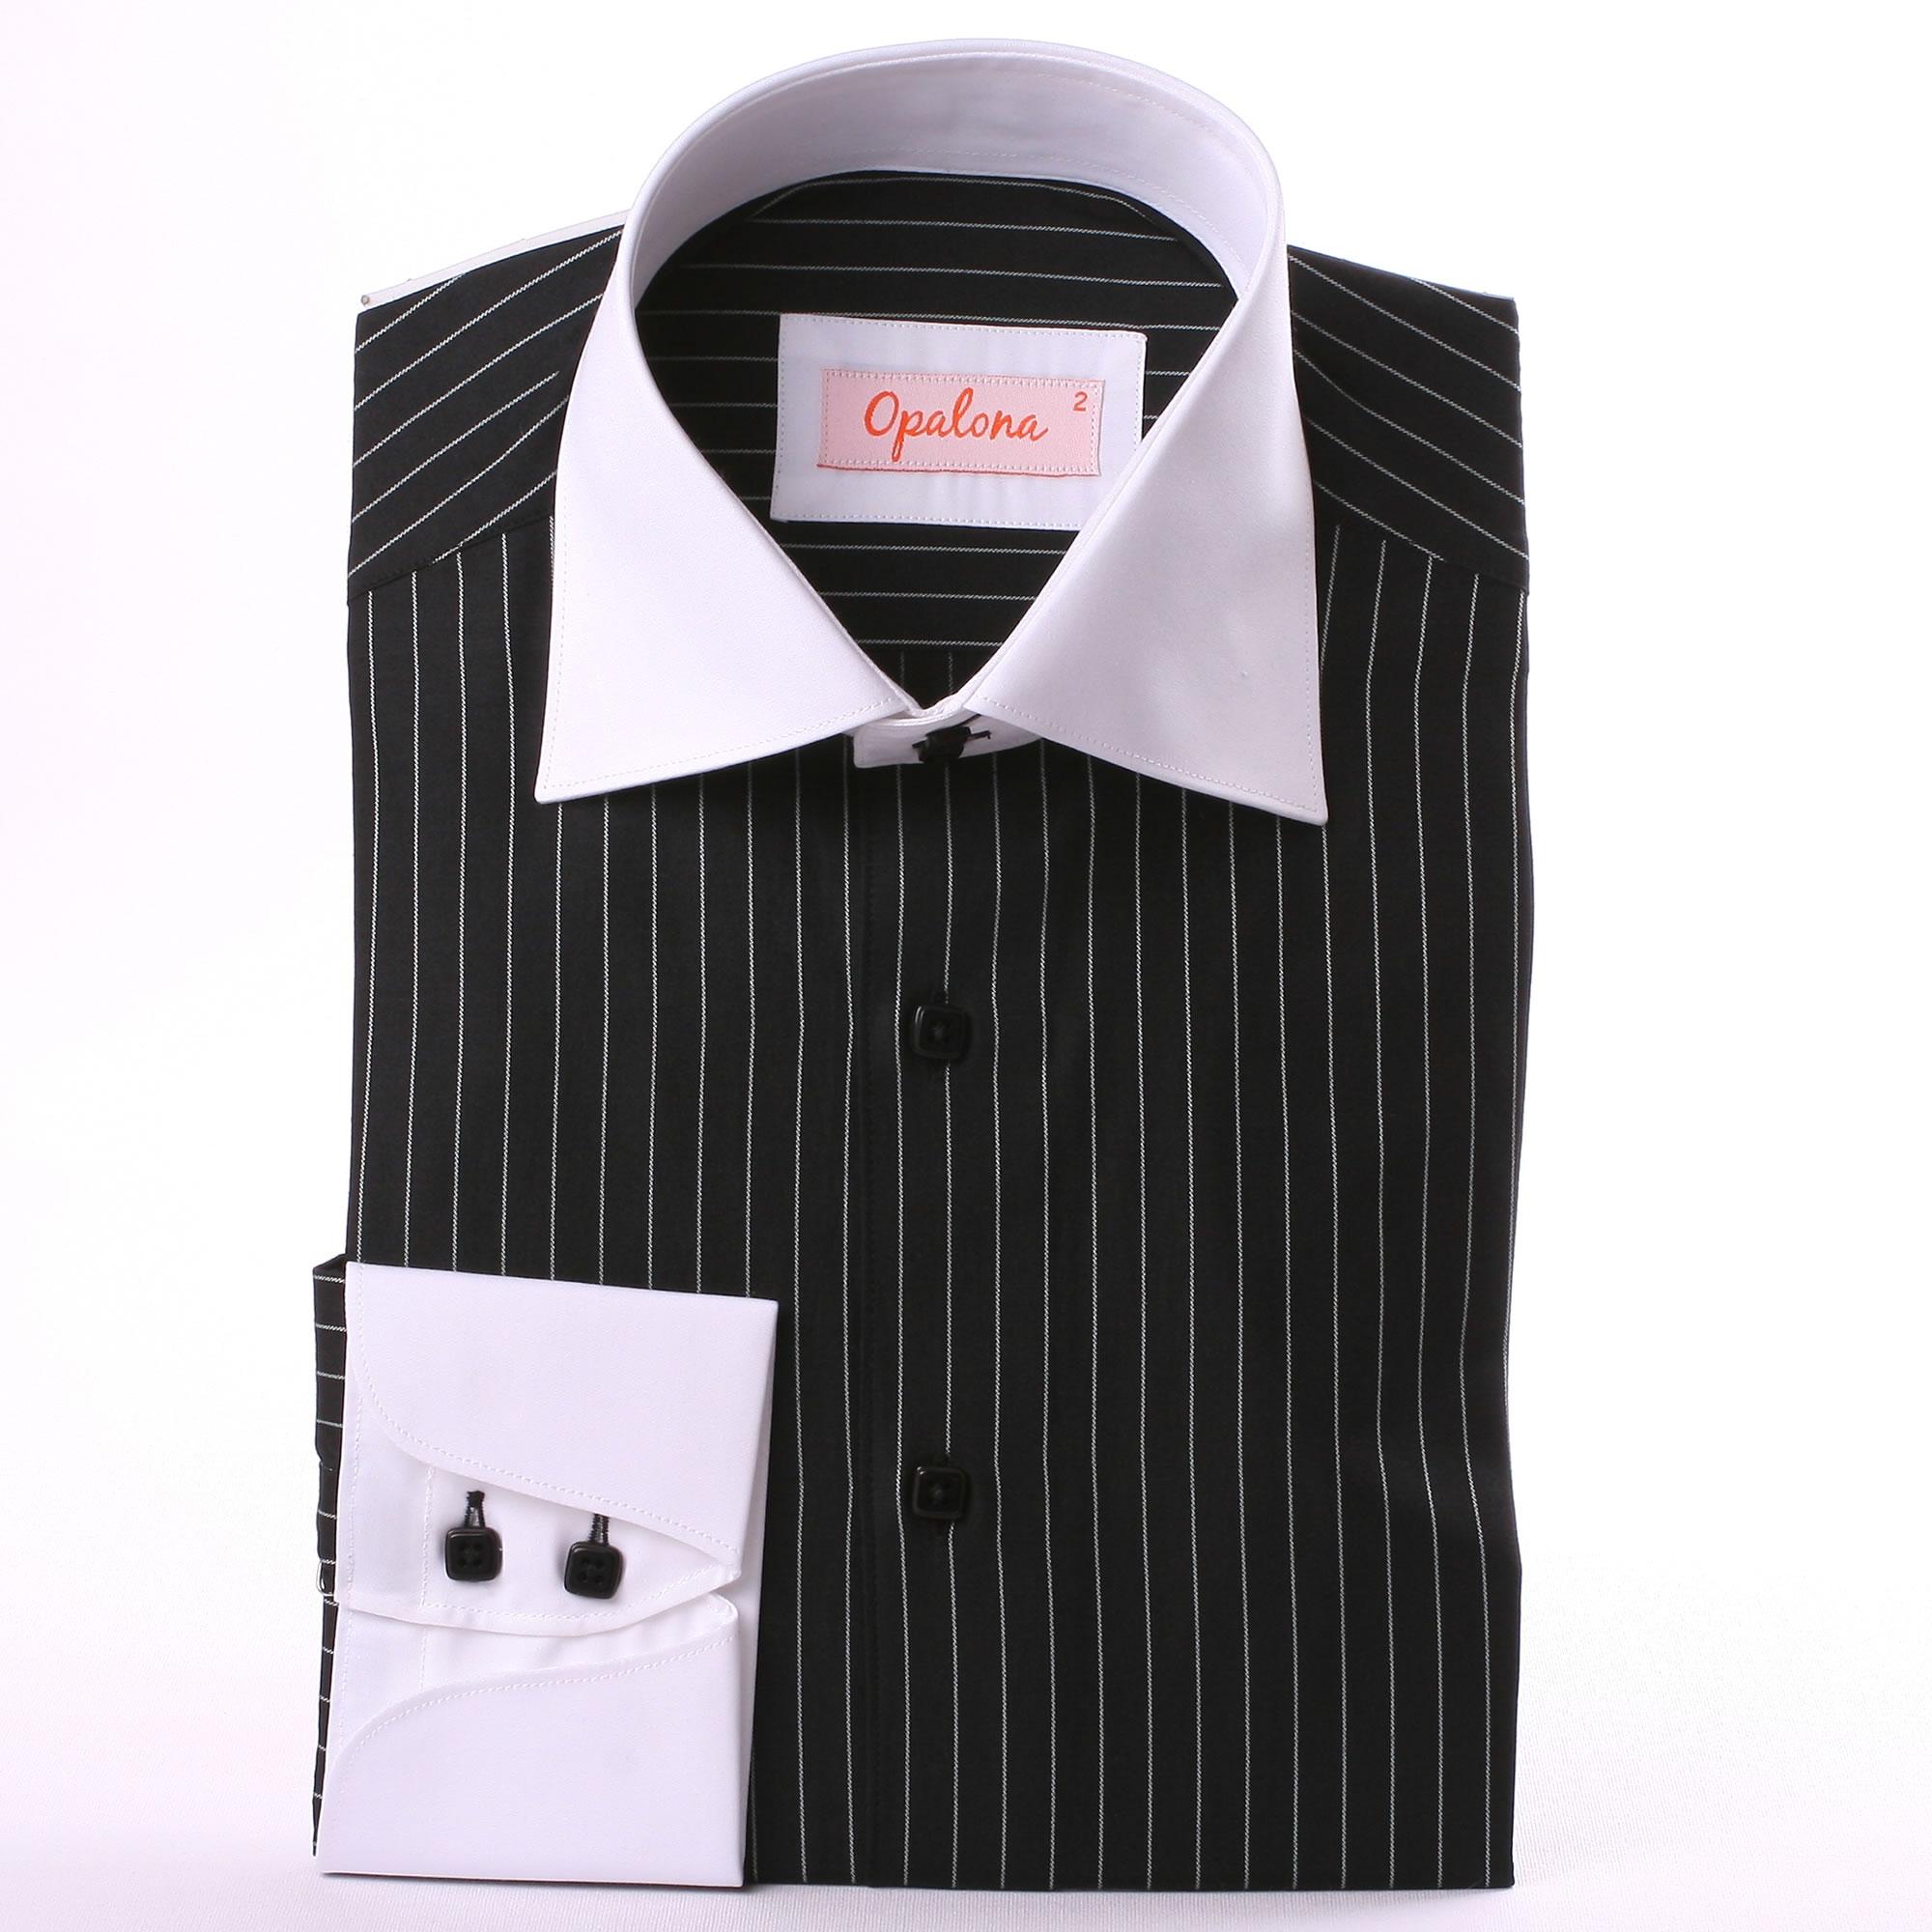 Black with white stripes shirt white collar and napolitan cuffs